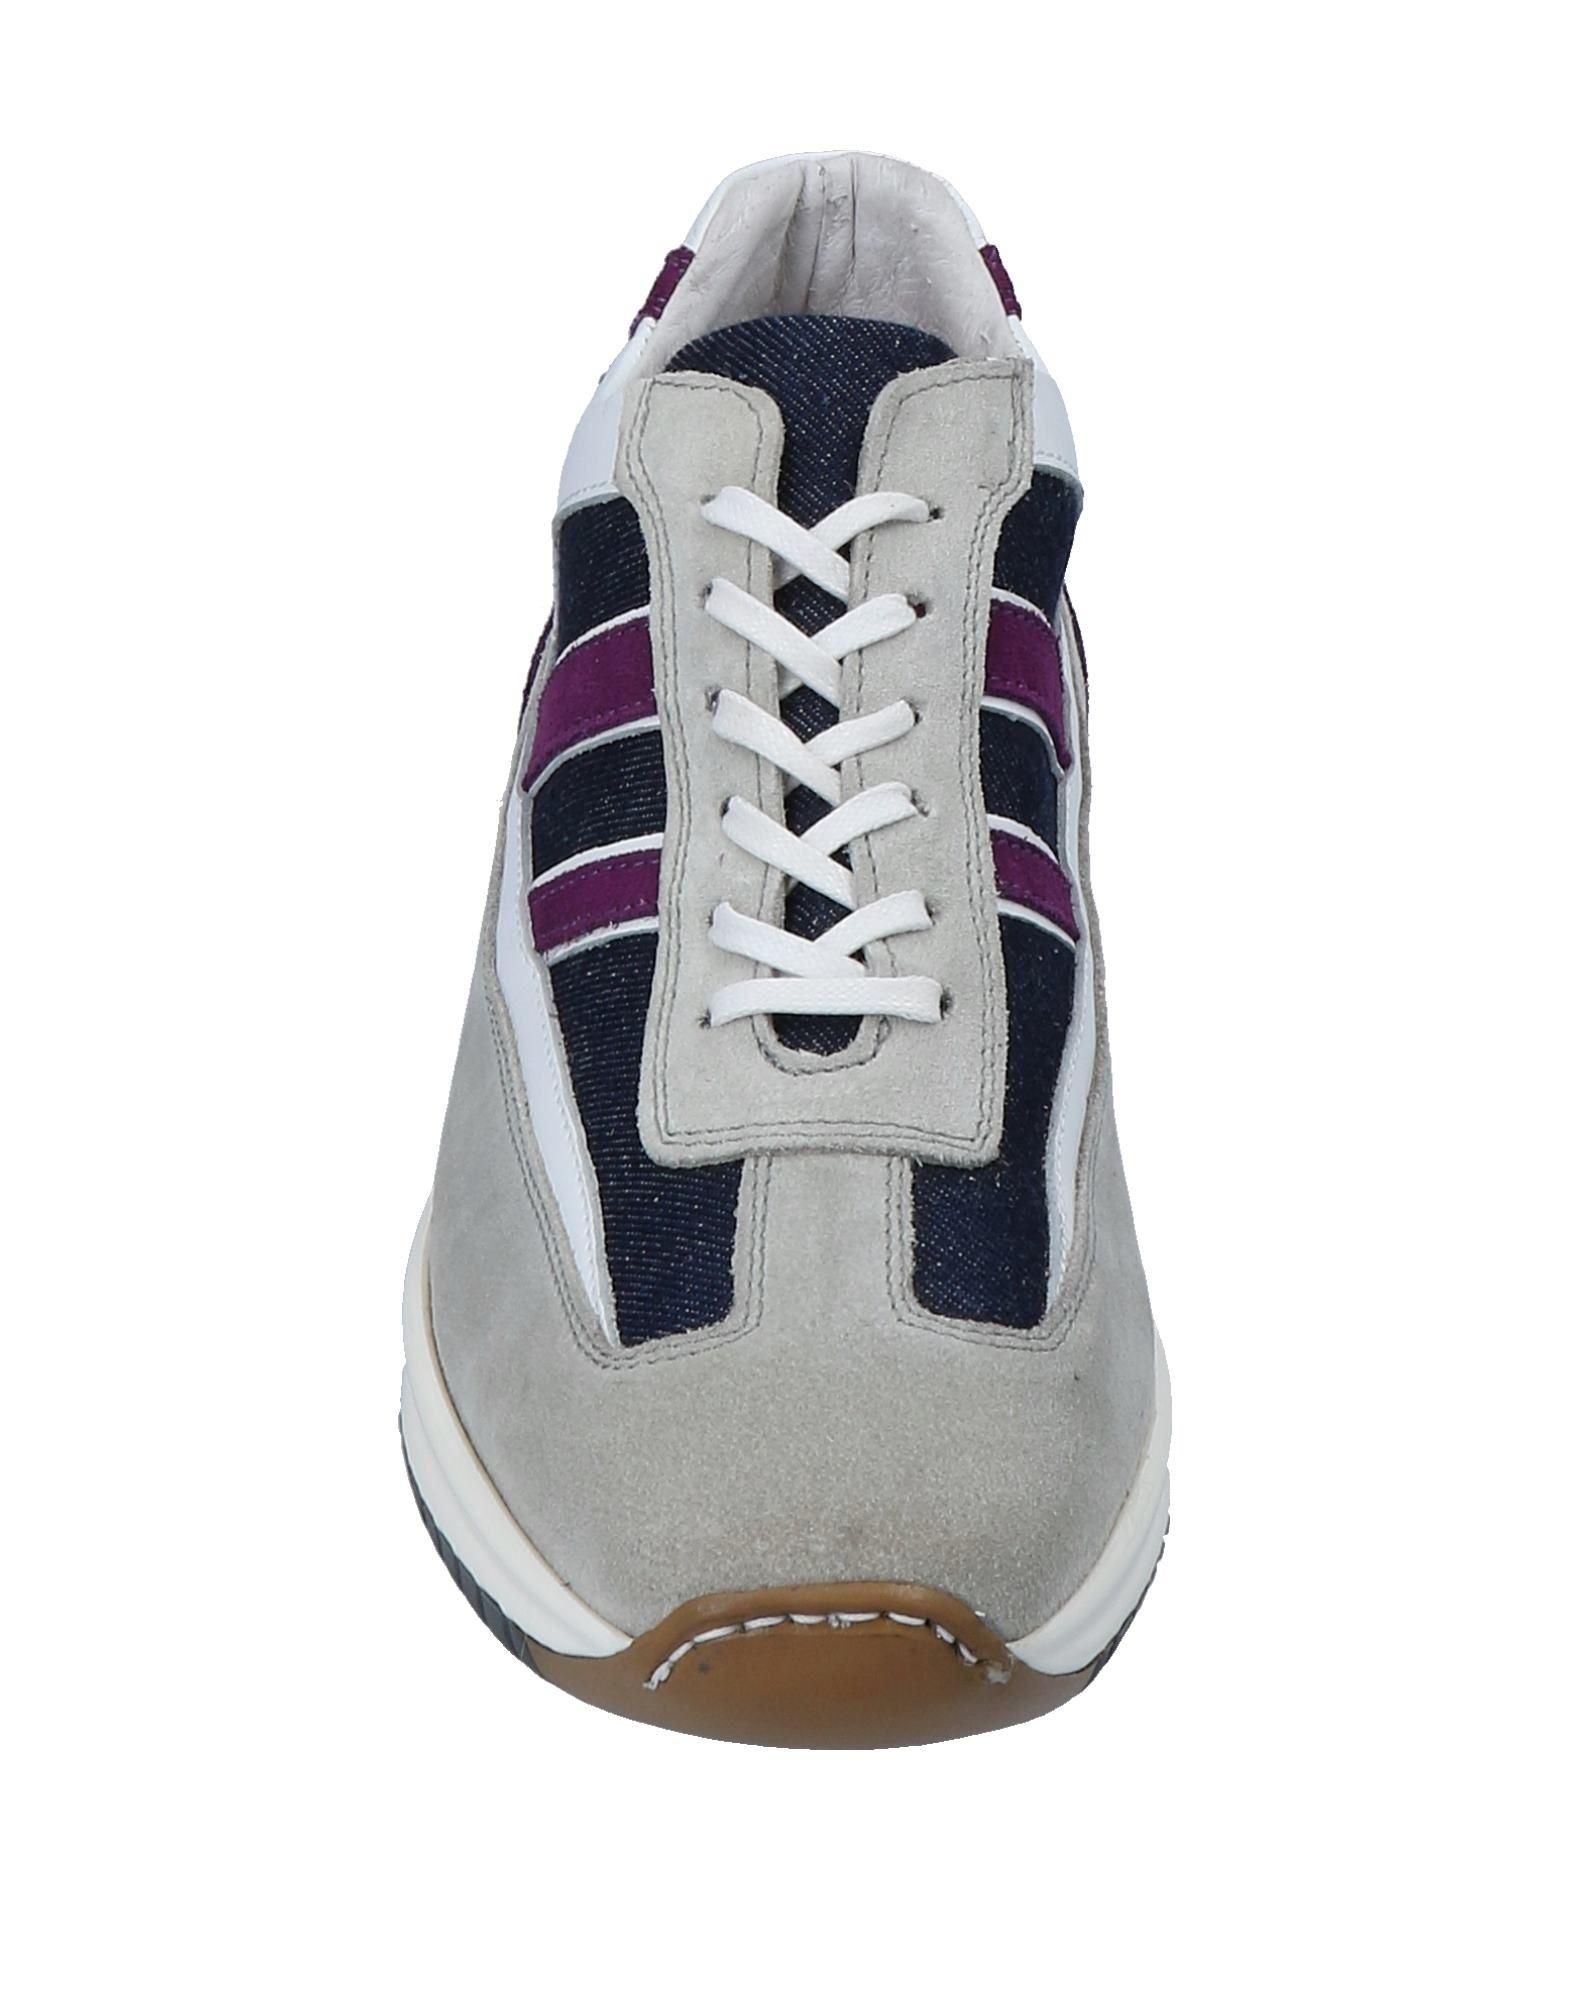 Rabatt echte Schuhe Salvo Barone 11555969GA Sneakers Herren  11555969GA Barone 04c66b